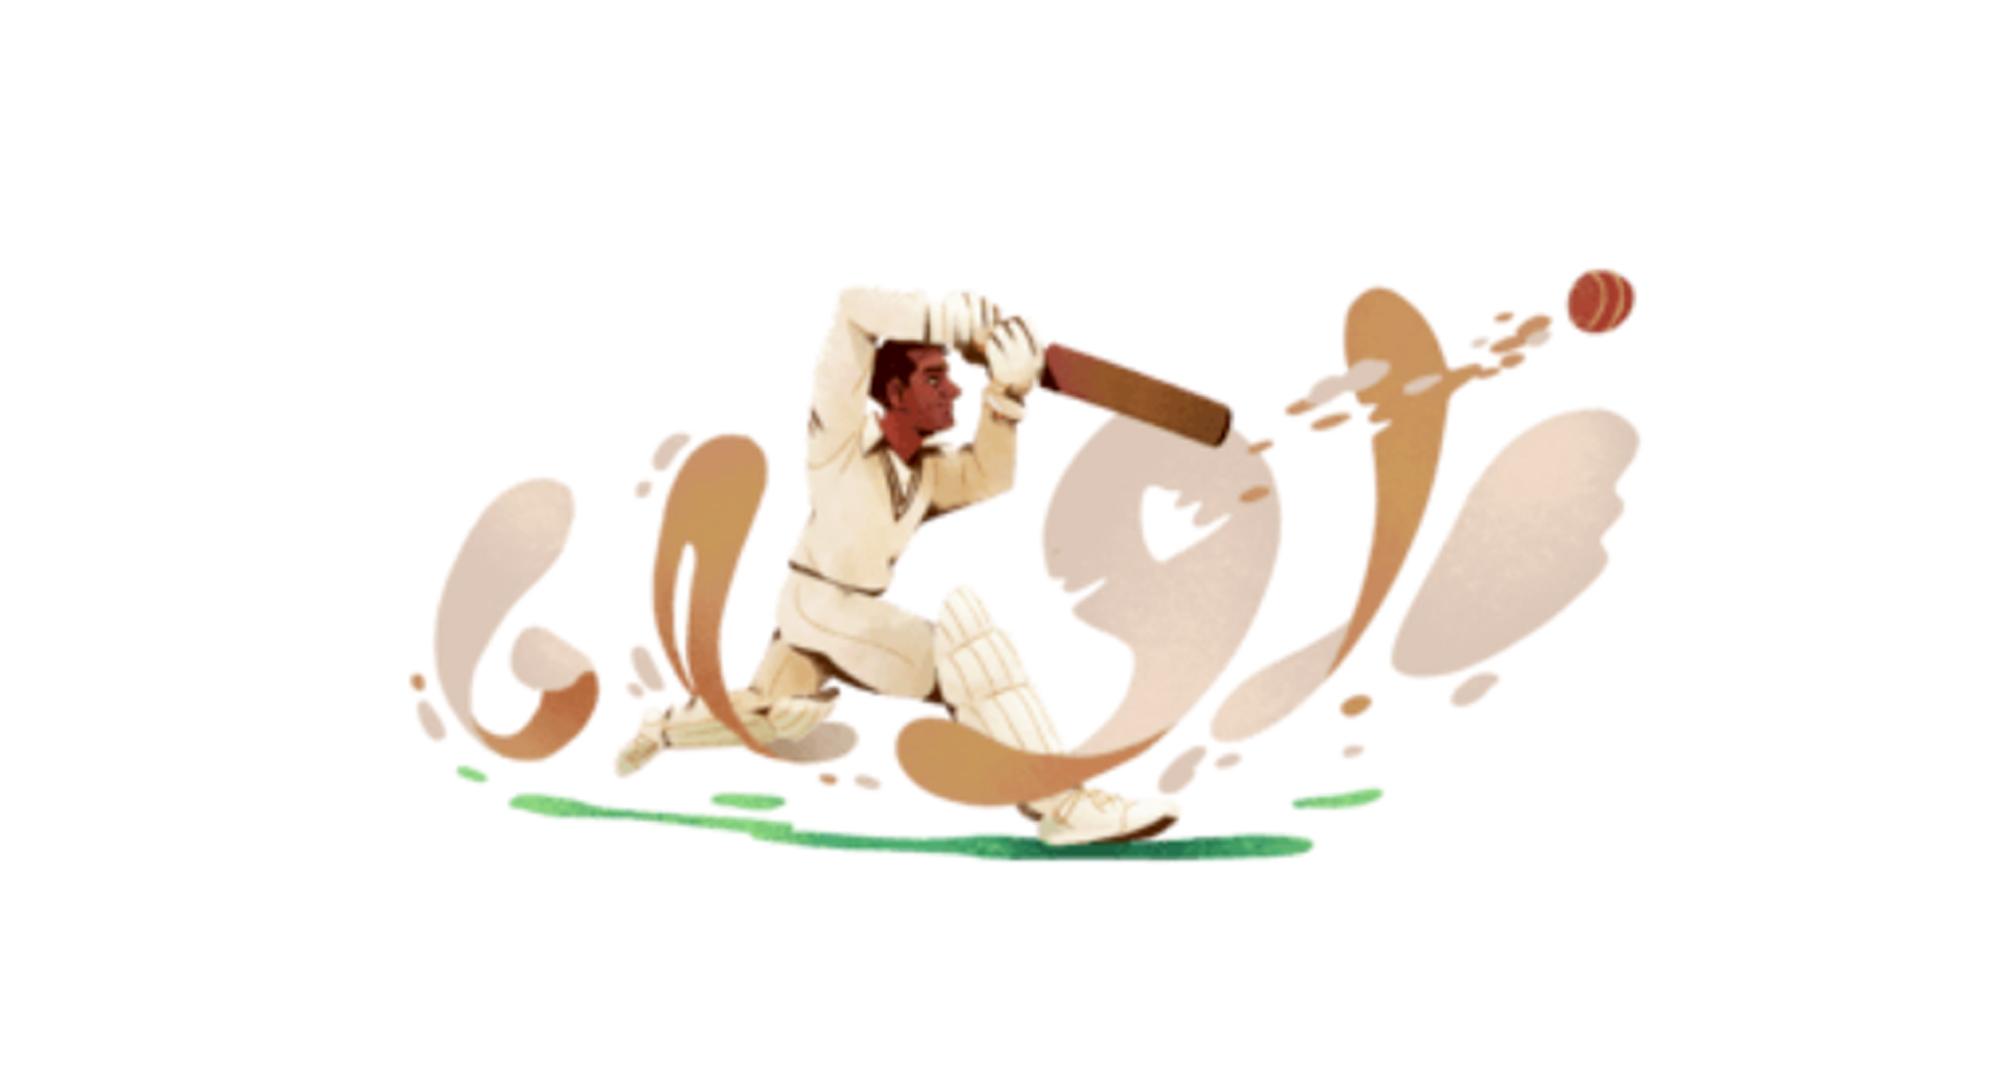 google pays tribute to abdul hafeez kardar on 94th birth anniversary